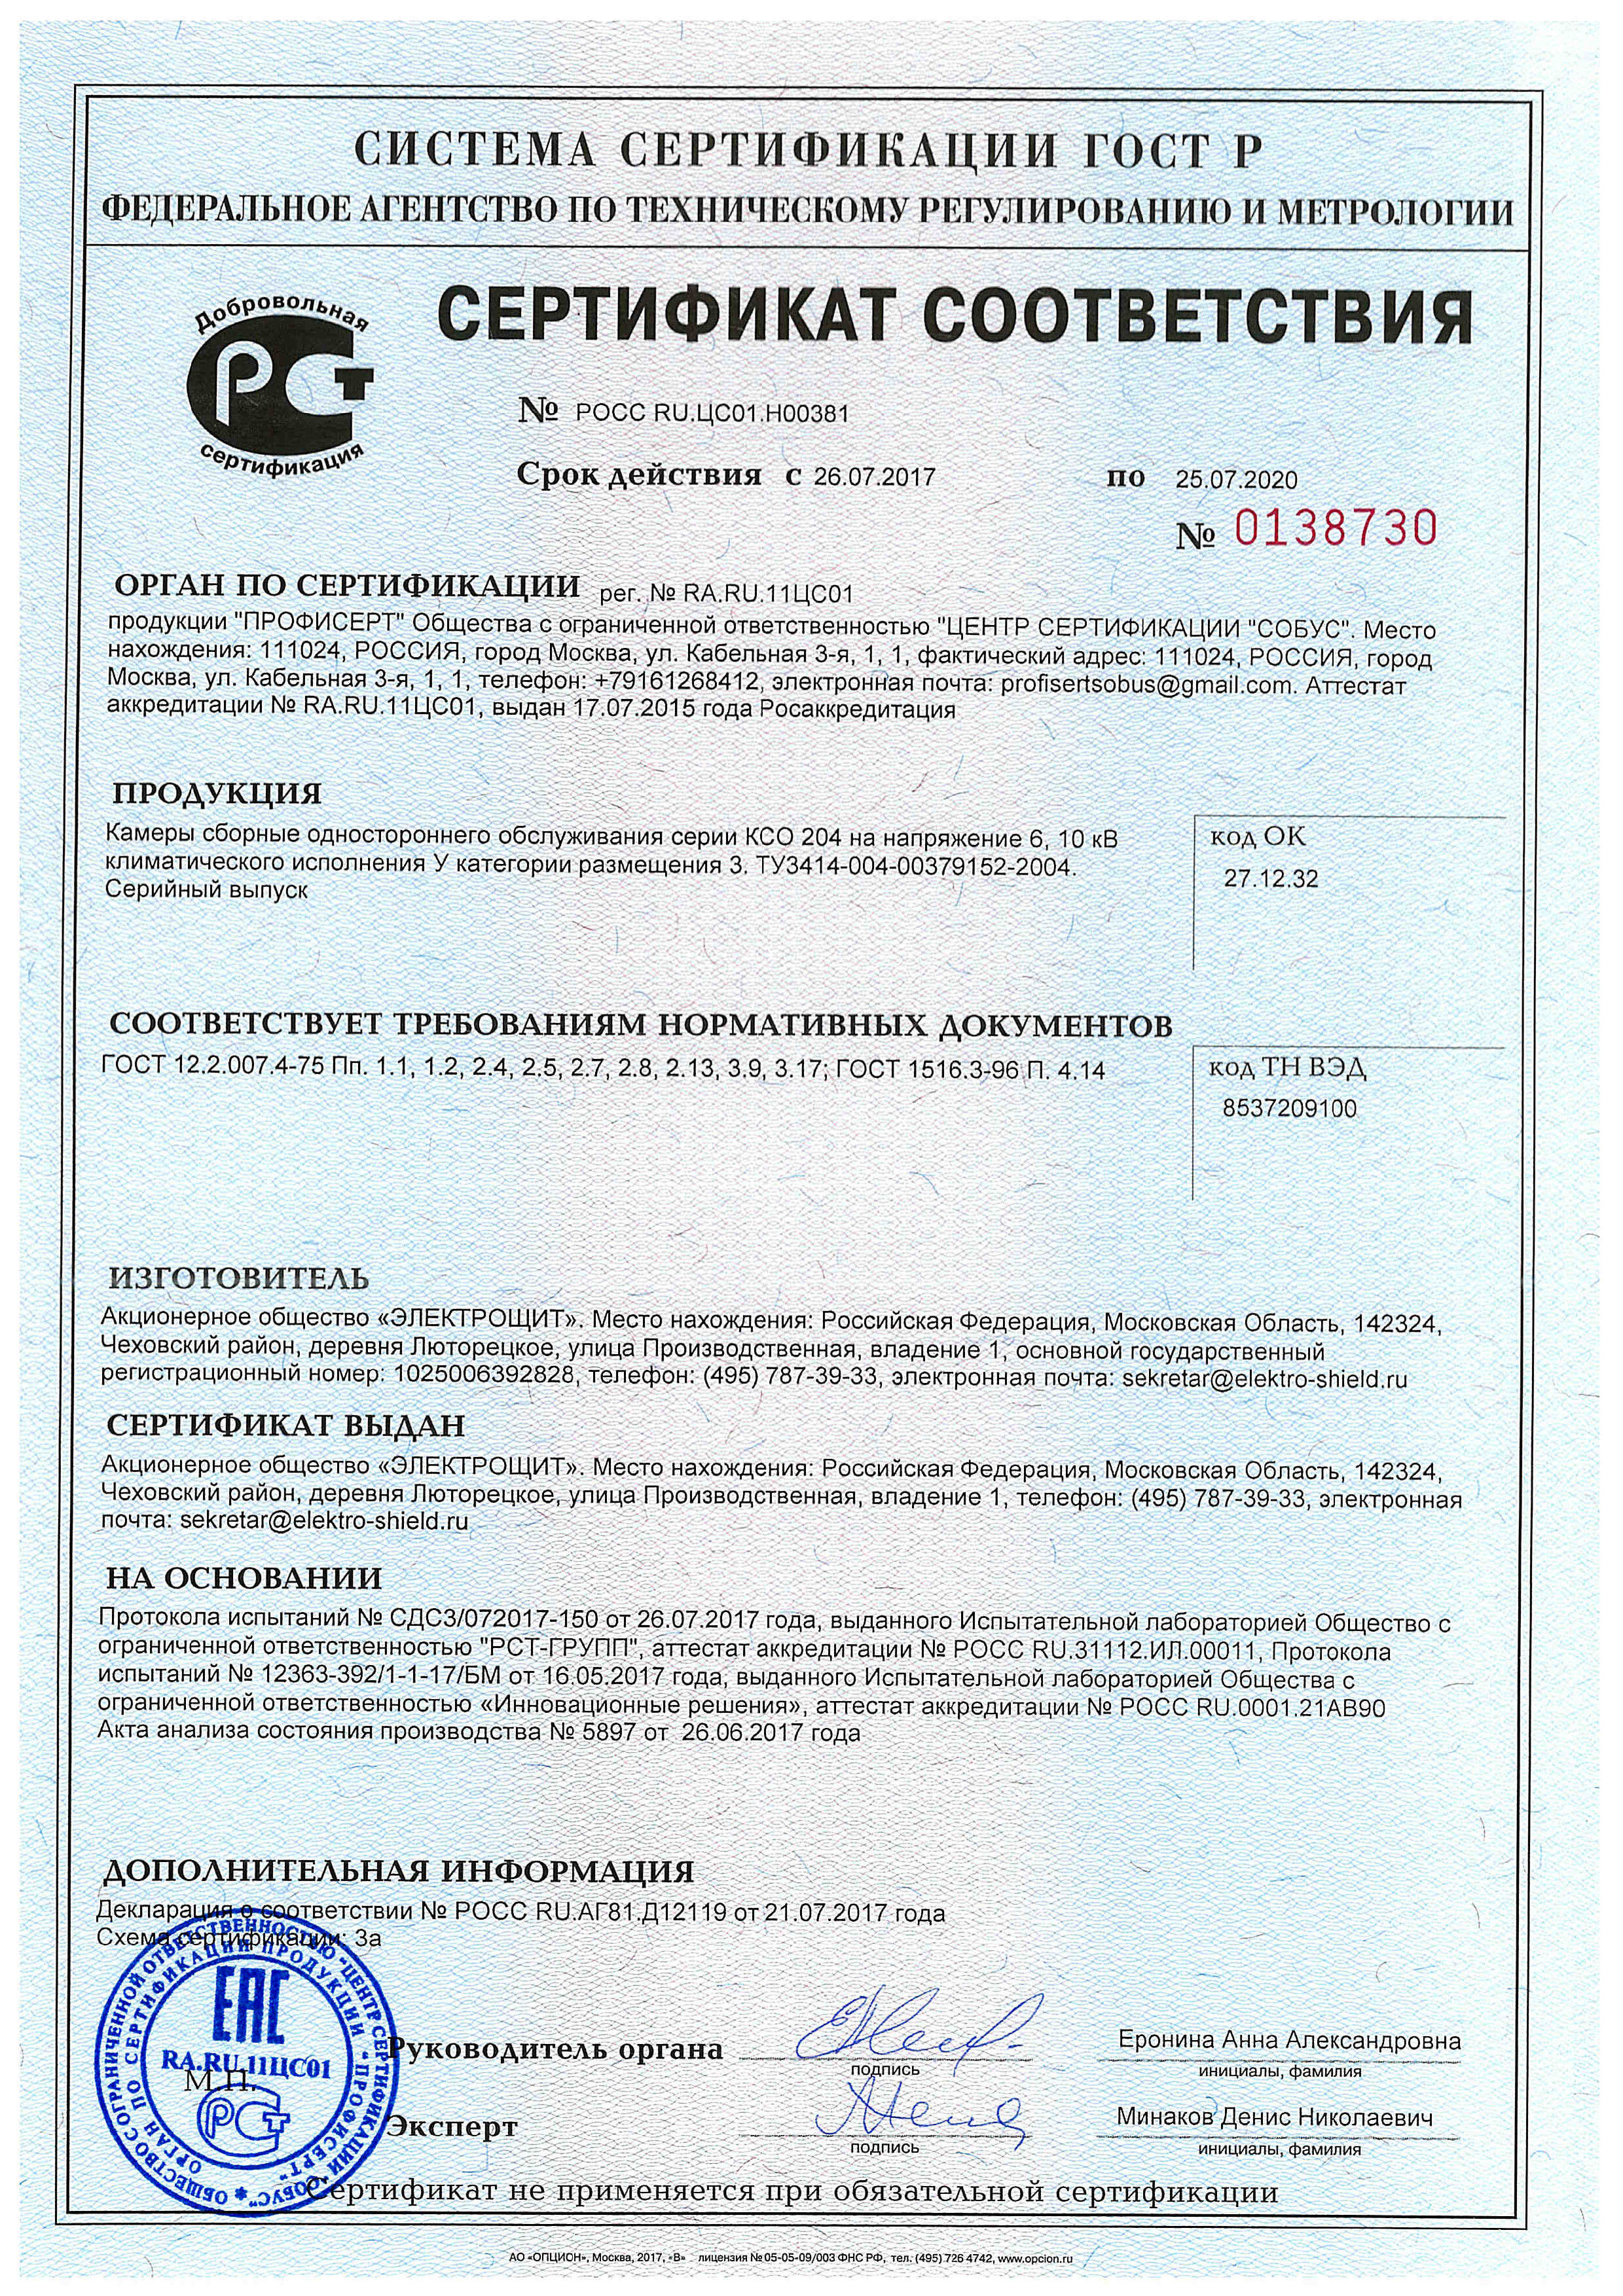 Сертификат КСО204 до 25.07.2020 (pdf.io)